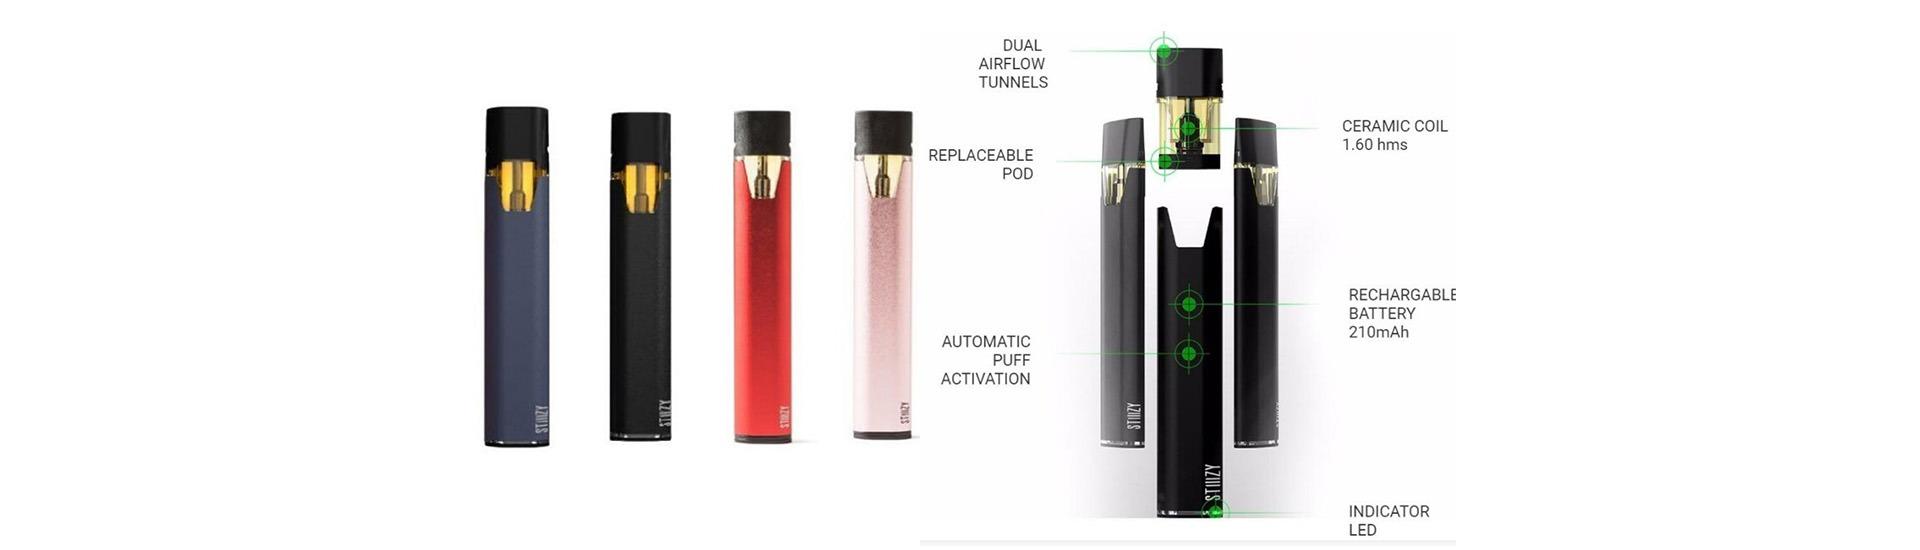 Shenzhen Rockitenail Technology Co , Ltd  - smoking accessories